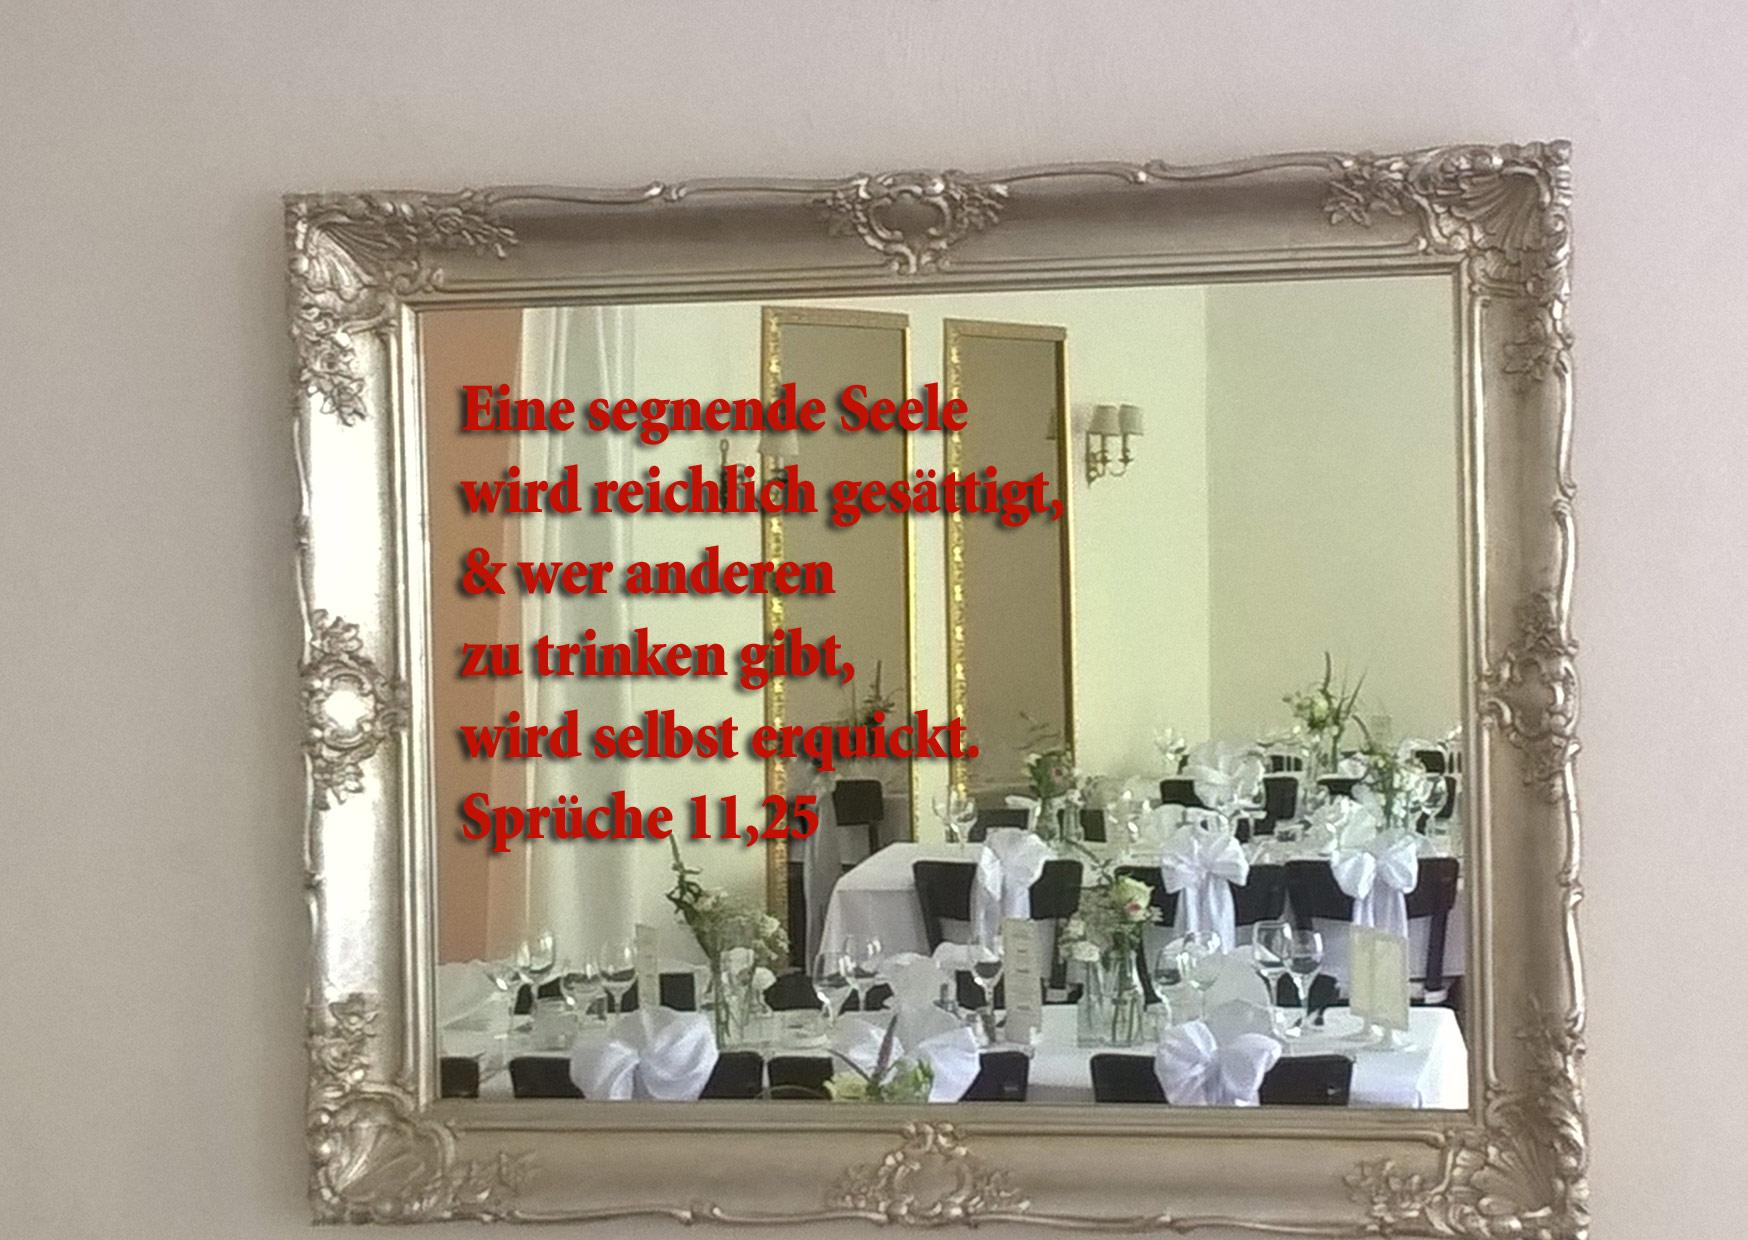 Spiegel, Bibelzitat, Sprüche 11, 25, Foto: Christine Danzer, go 4 Jesus